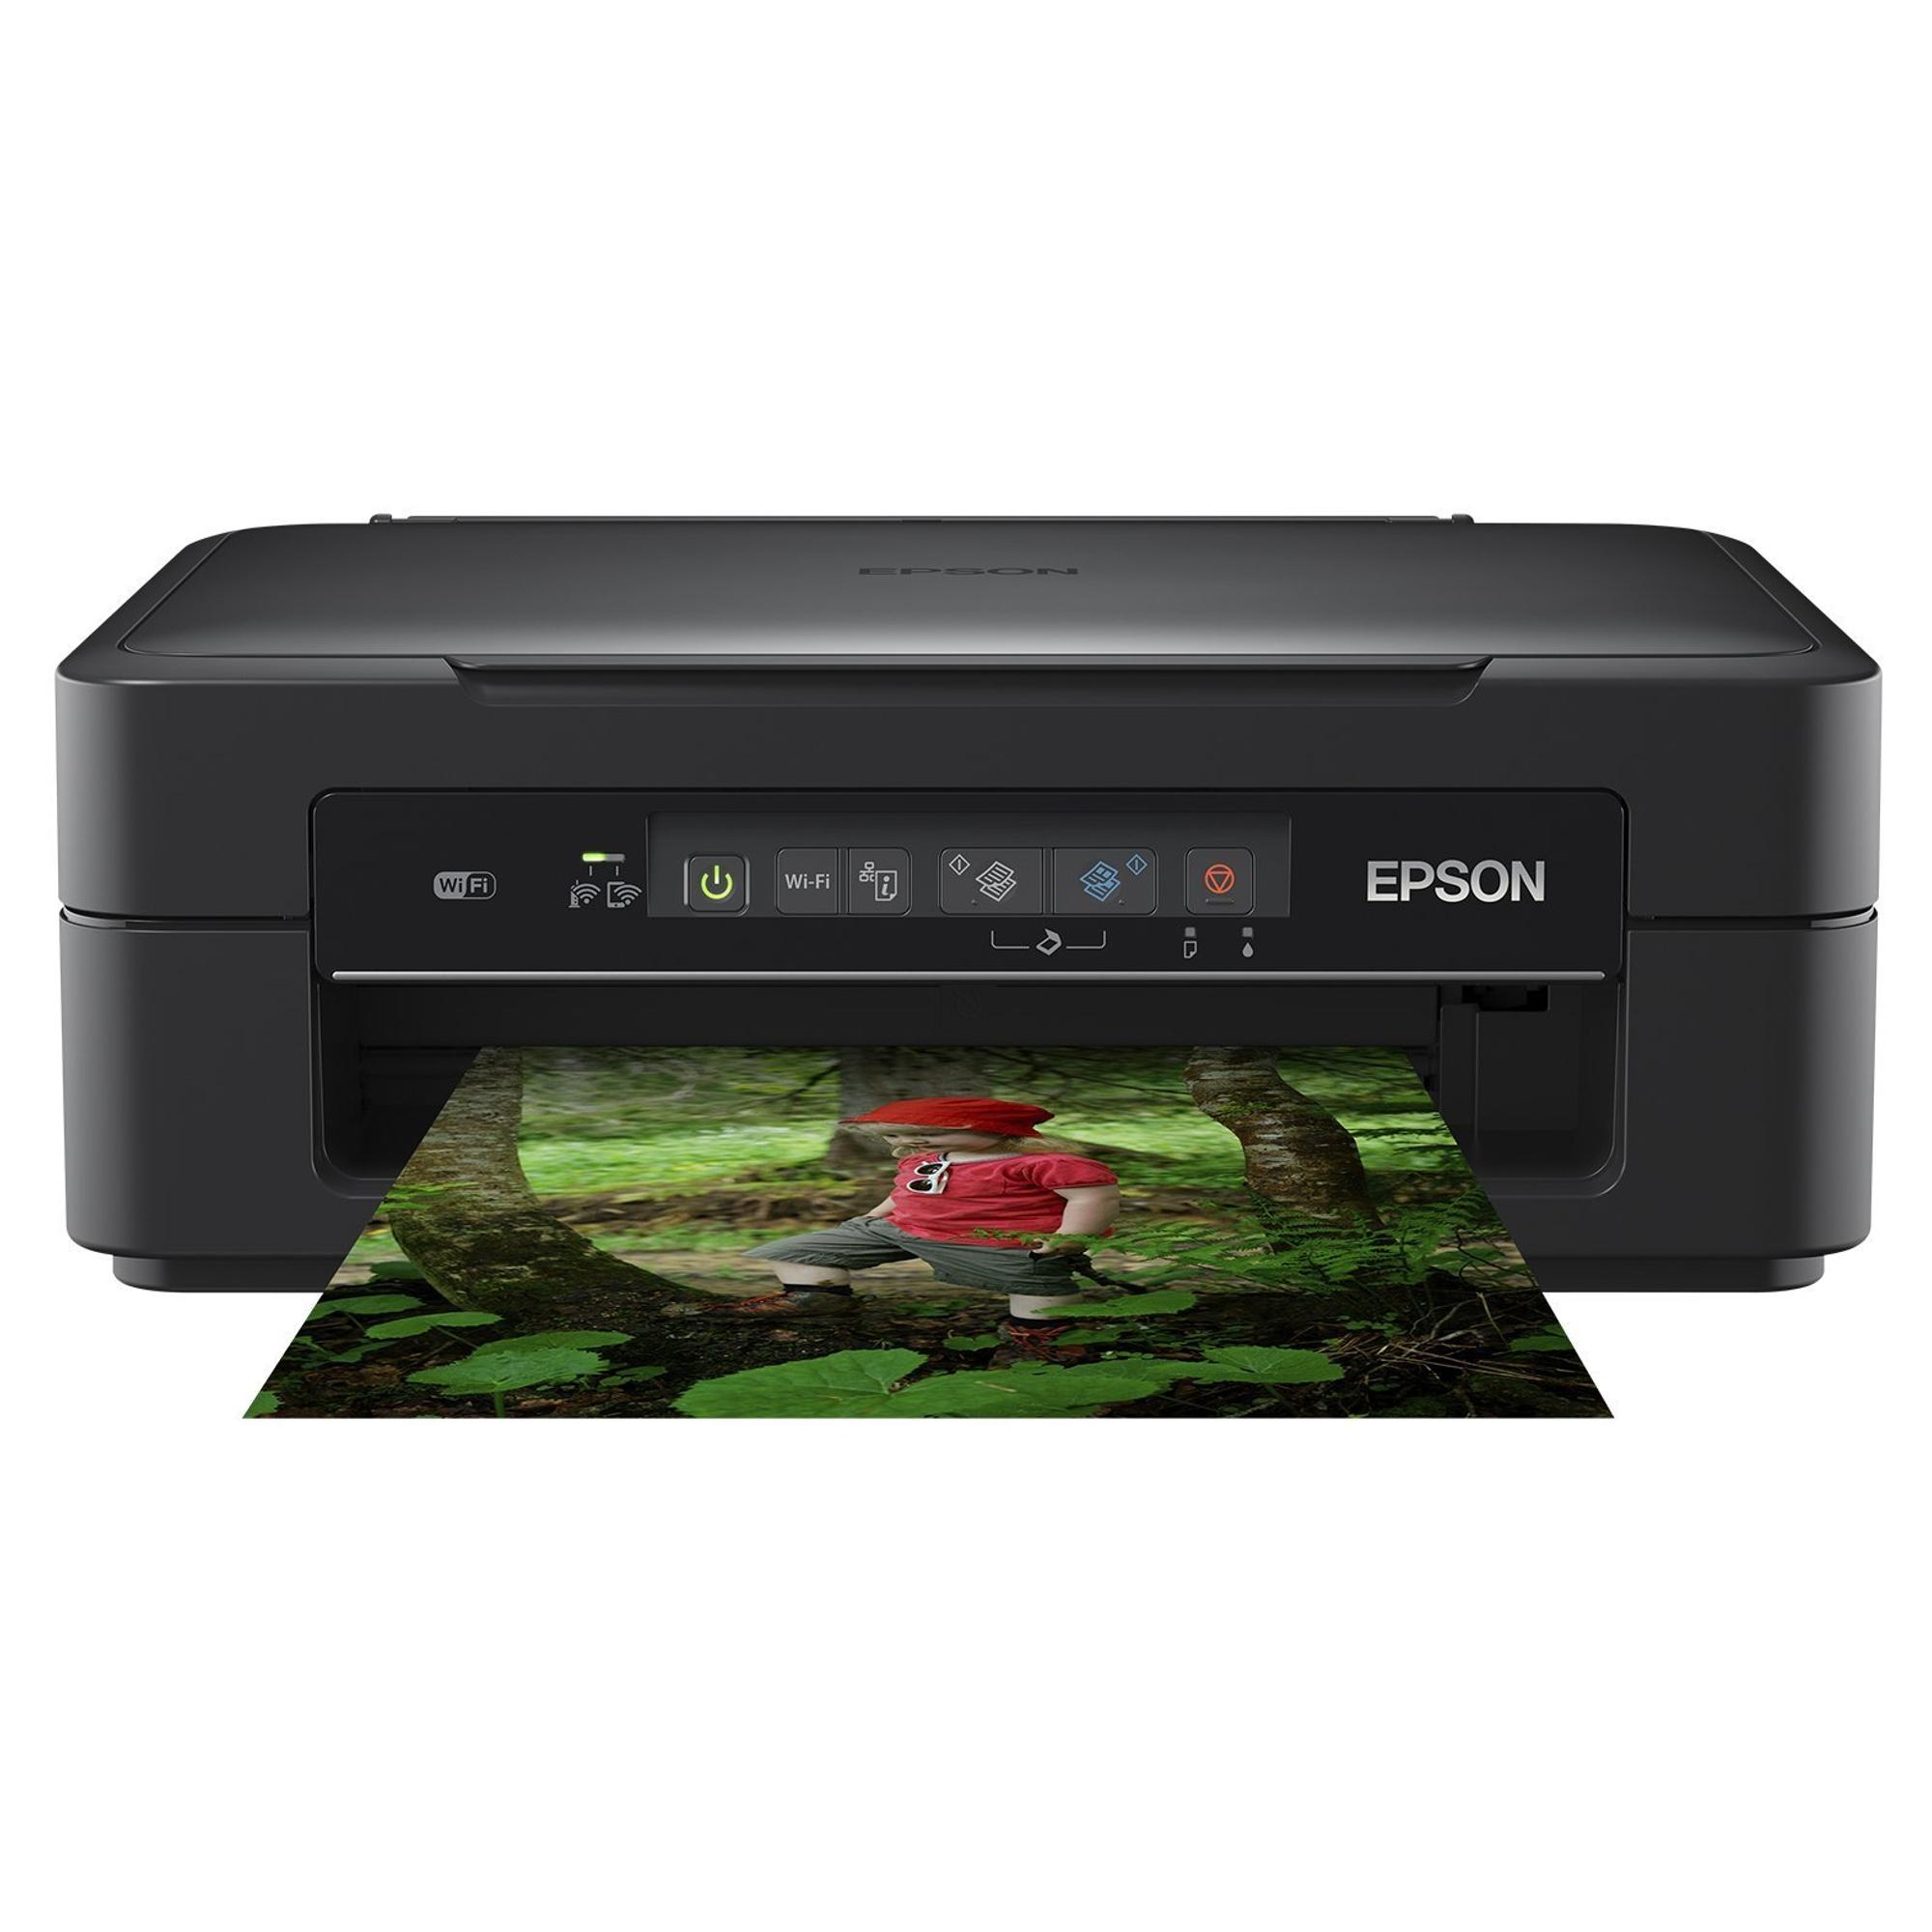 Epson Xp255 Wireless All In One Colour Inkjet Printer Hughes